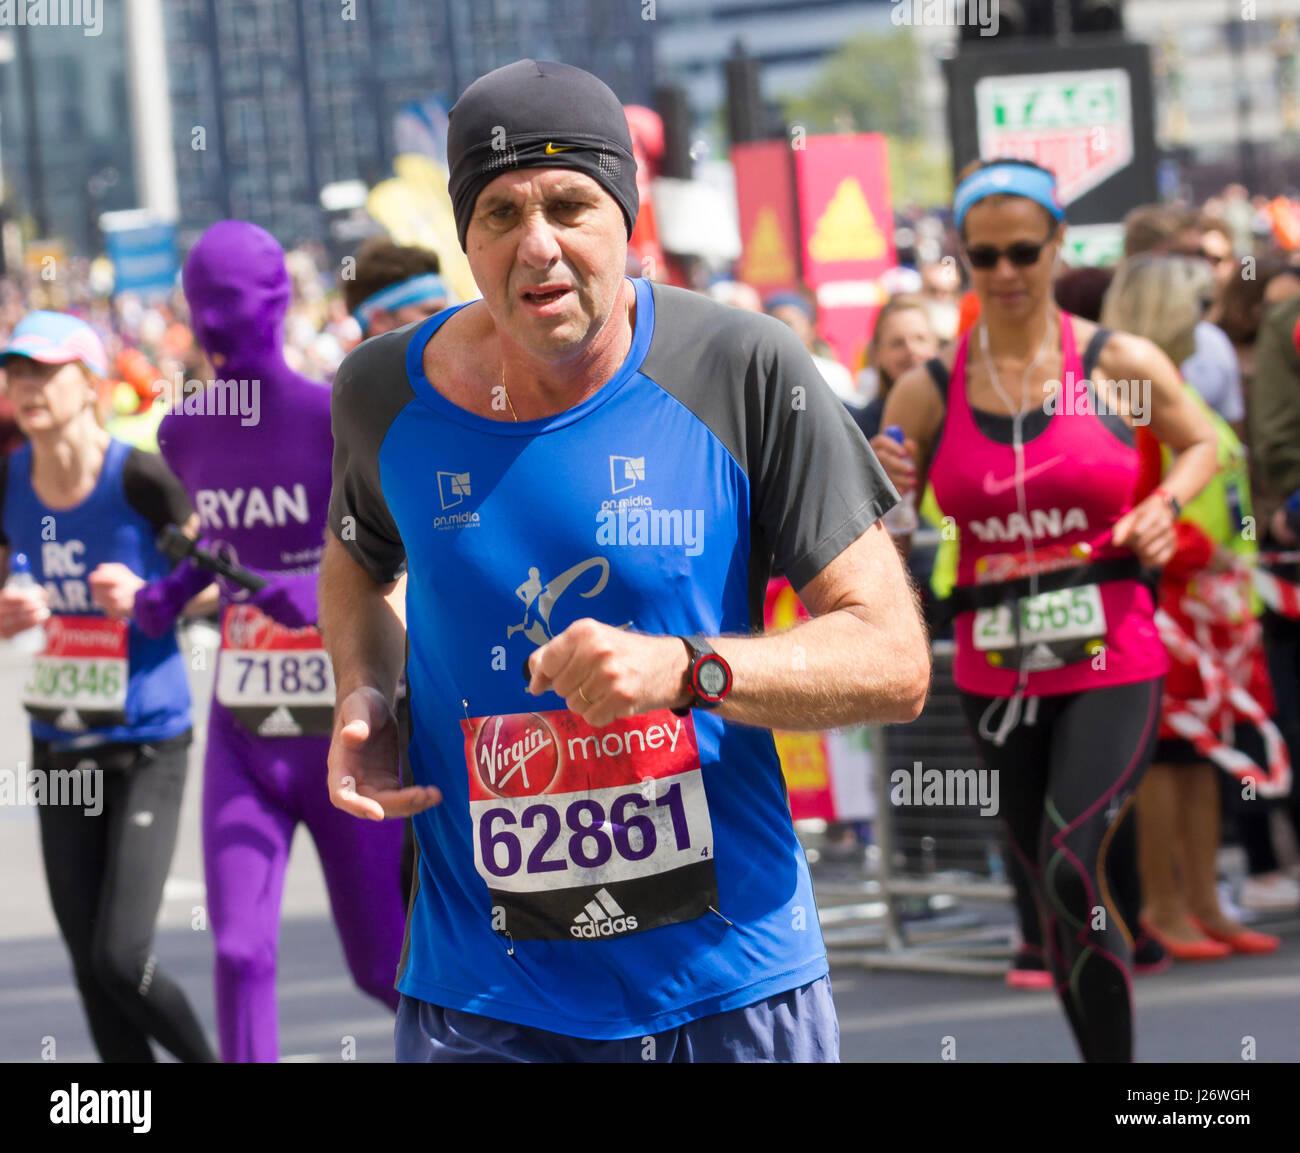 St Jame's Park, London,UK. 23rd April, 2017. Thousands take part in the 37th London Marathon Stock Photo